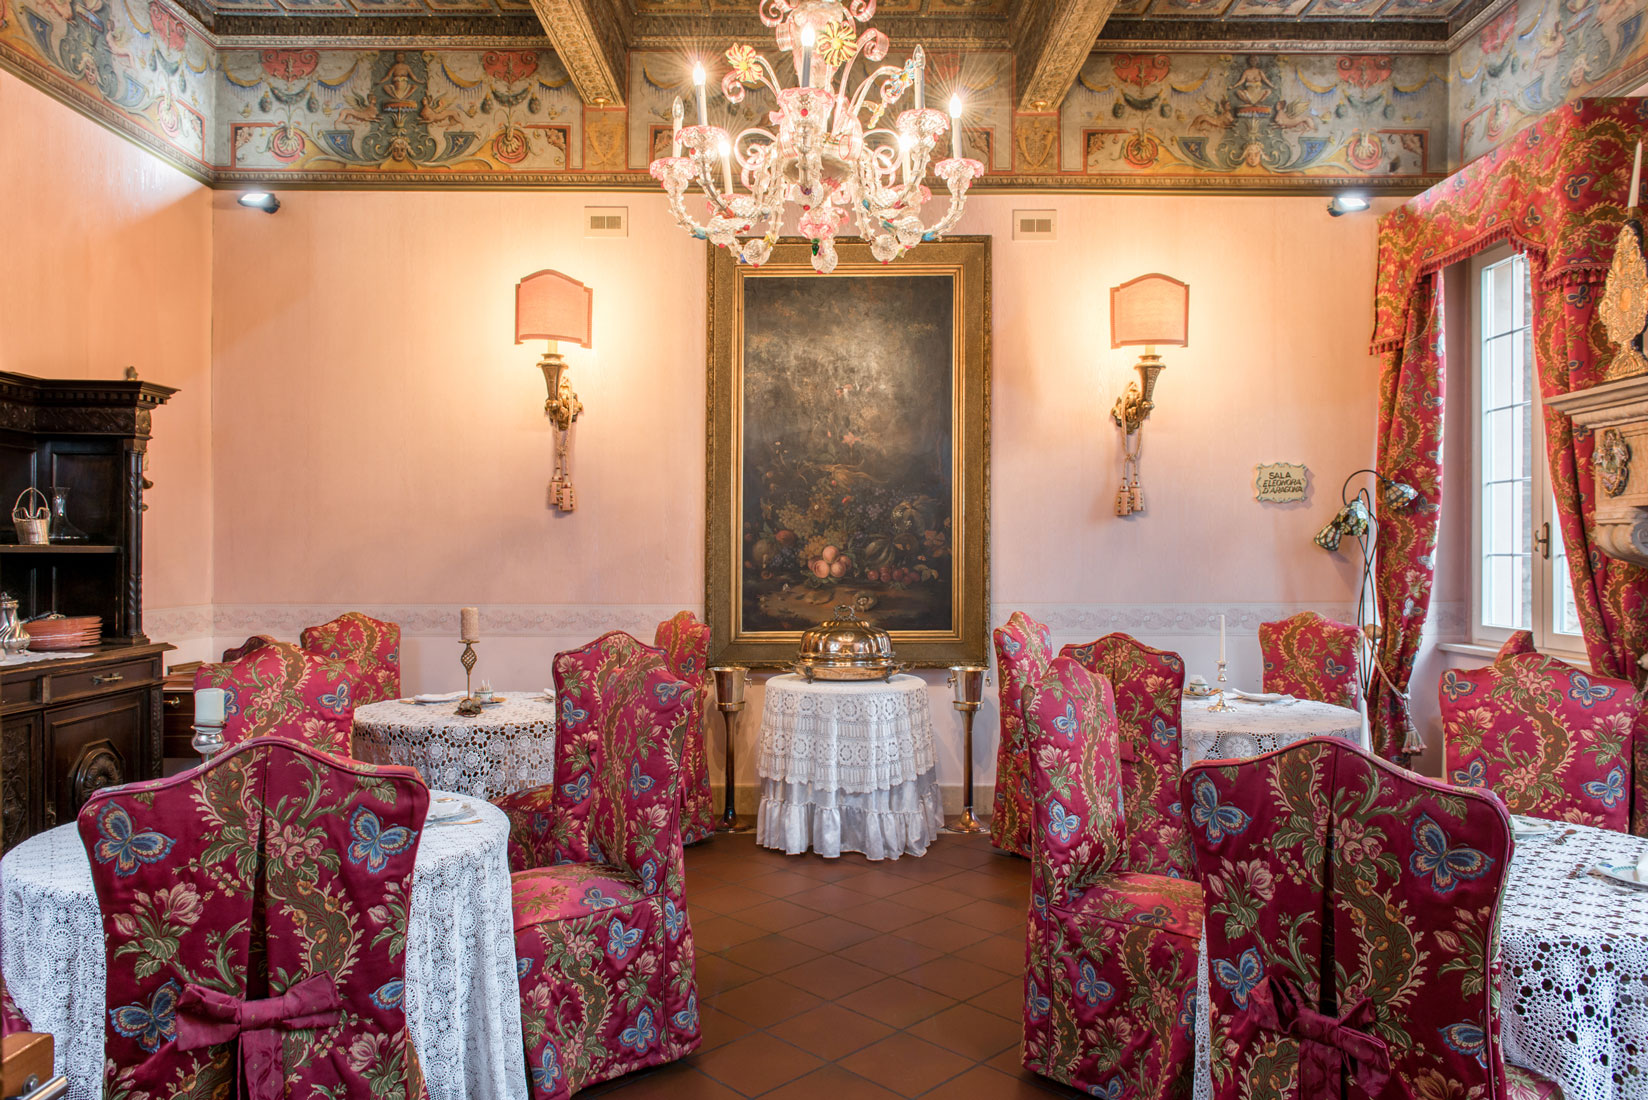 https://www.orlandinifrancesco.com/wp/wp-content/uploads/2019/01/Duchessa-Isabella-Ferrara-Posti-Comuni-9.jpg